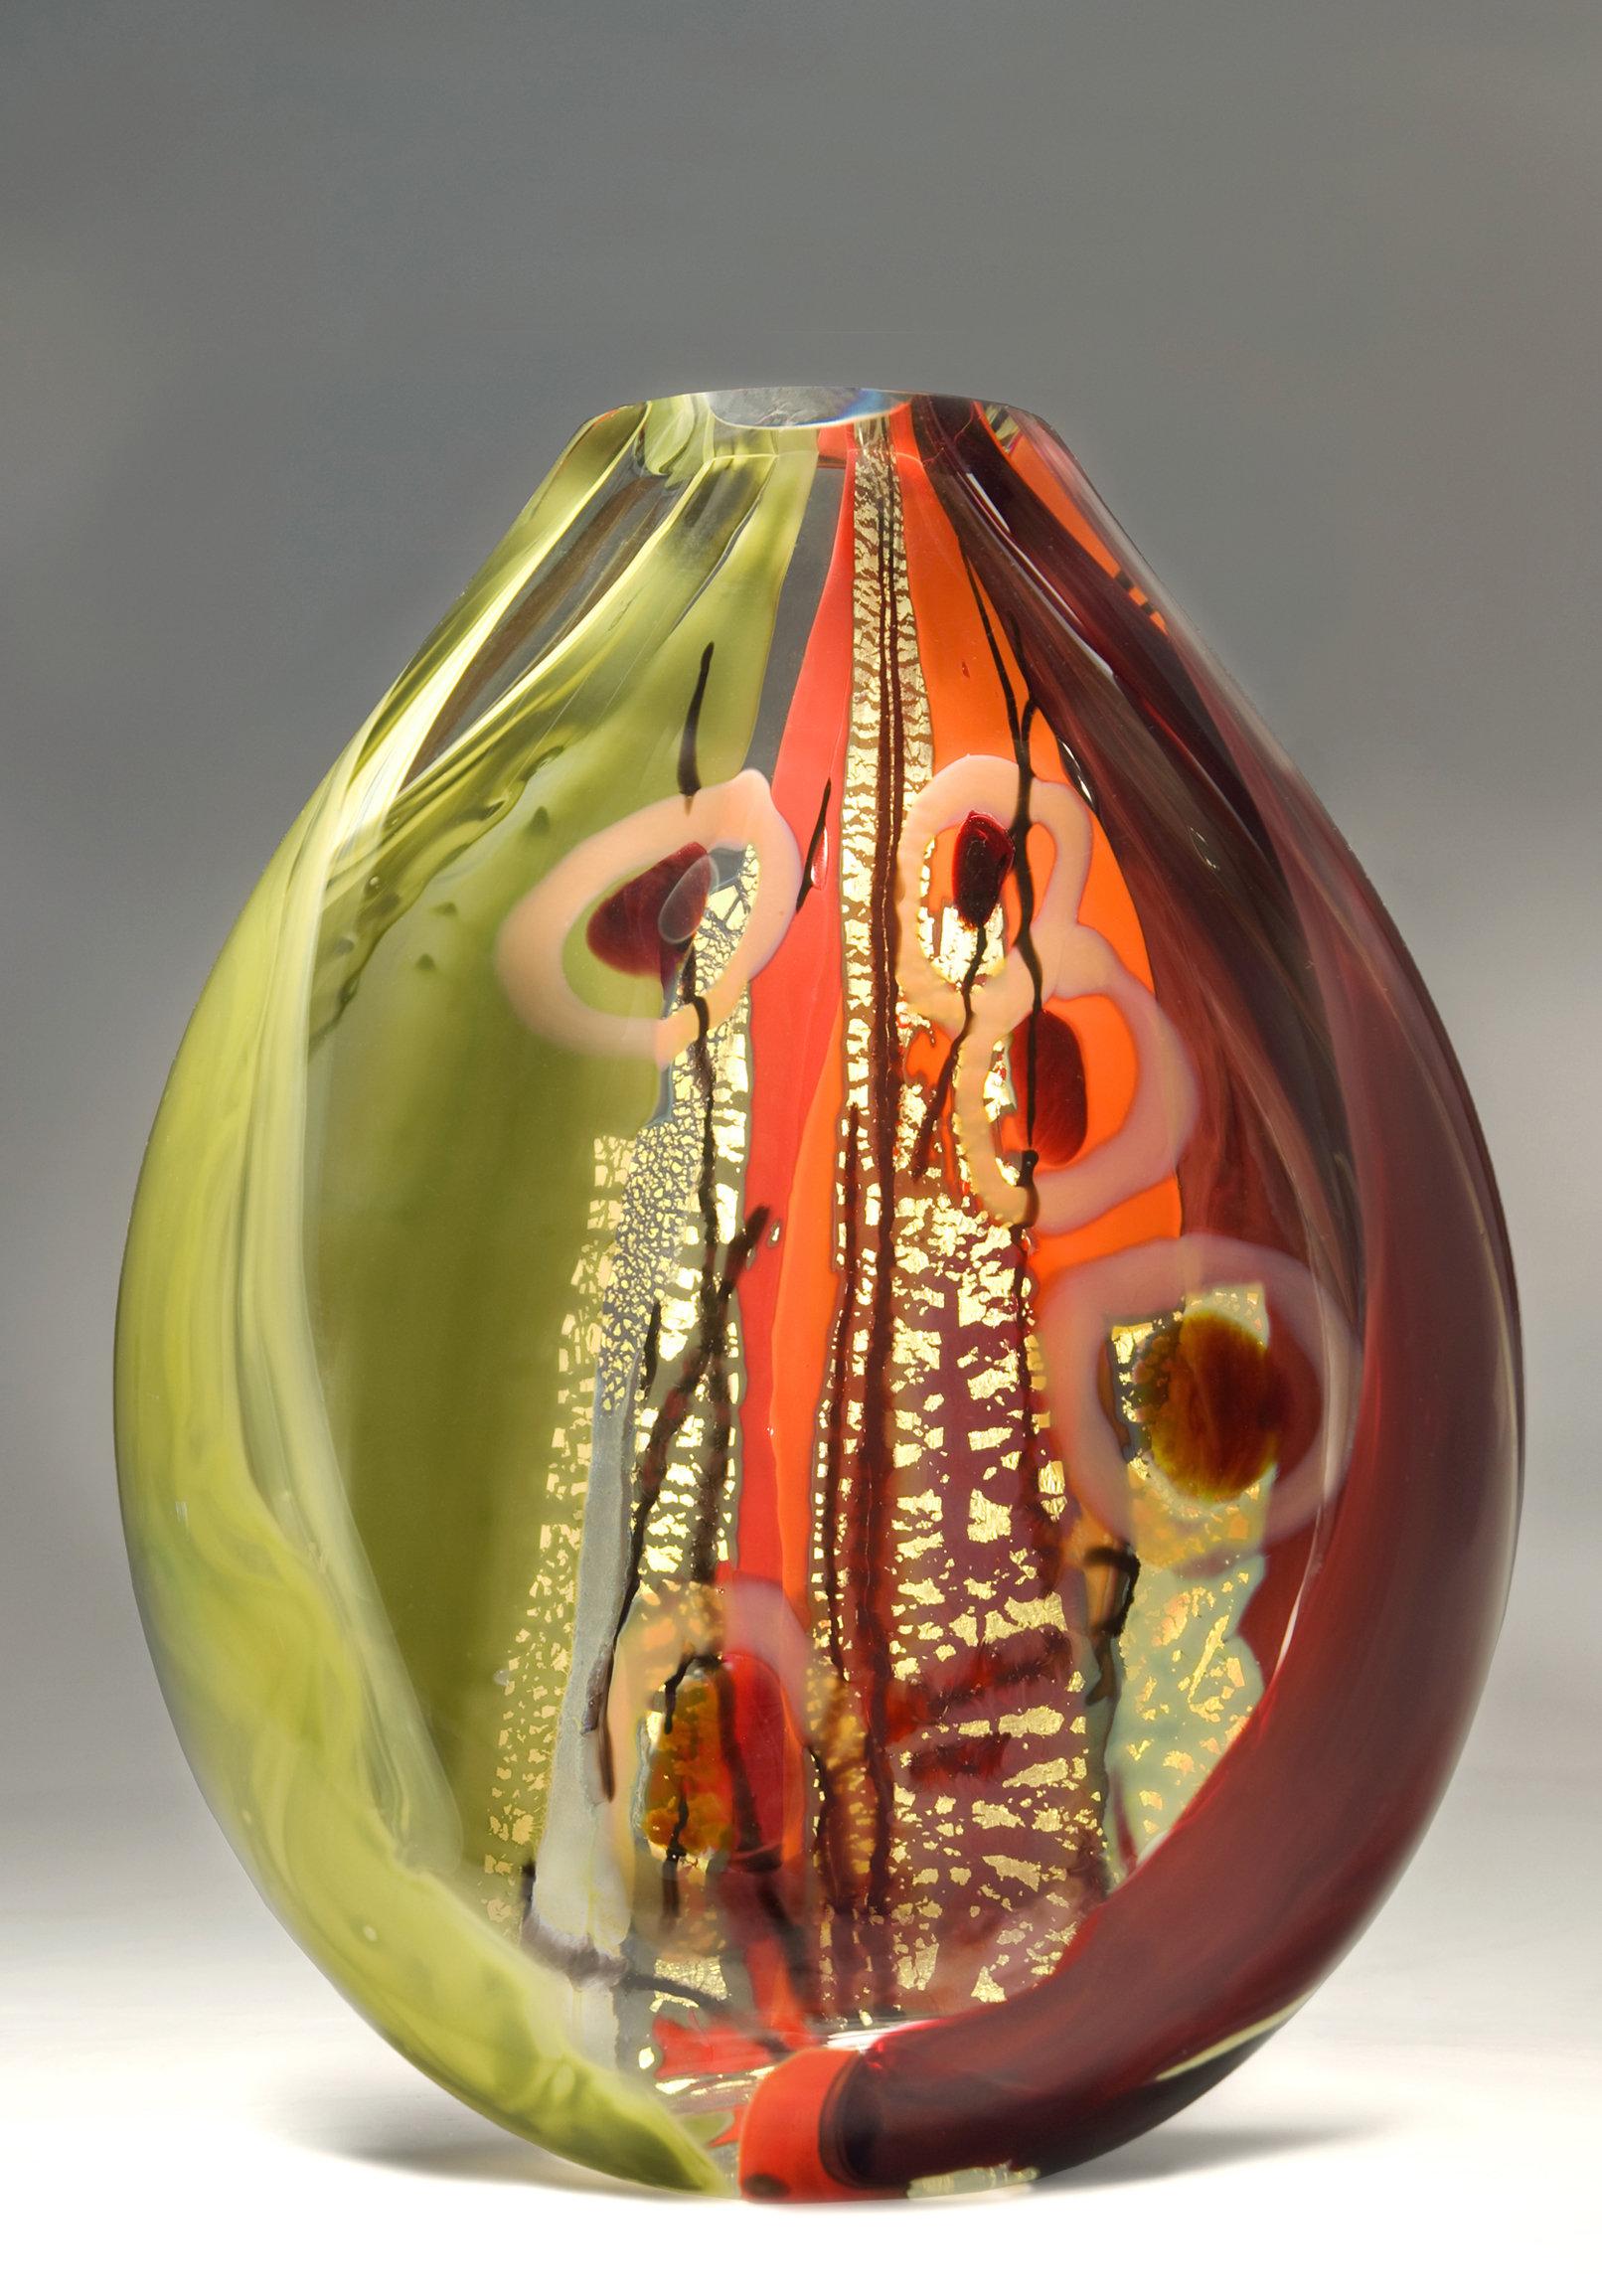 Large Glass Vessel : Sedona by Randi Solin (Art Glass Vessel) Artful Home